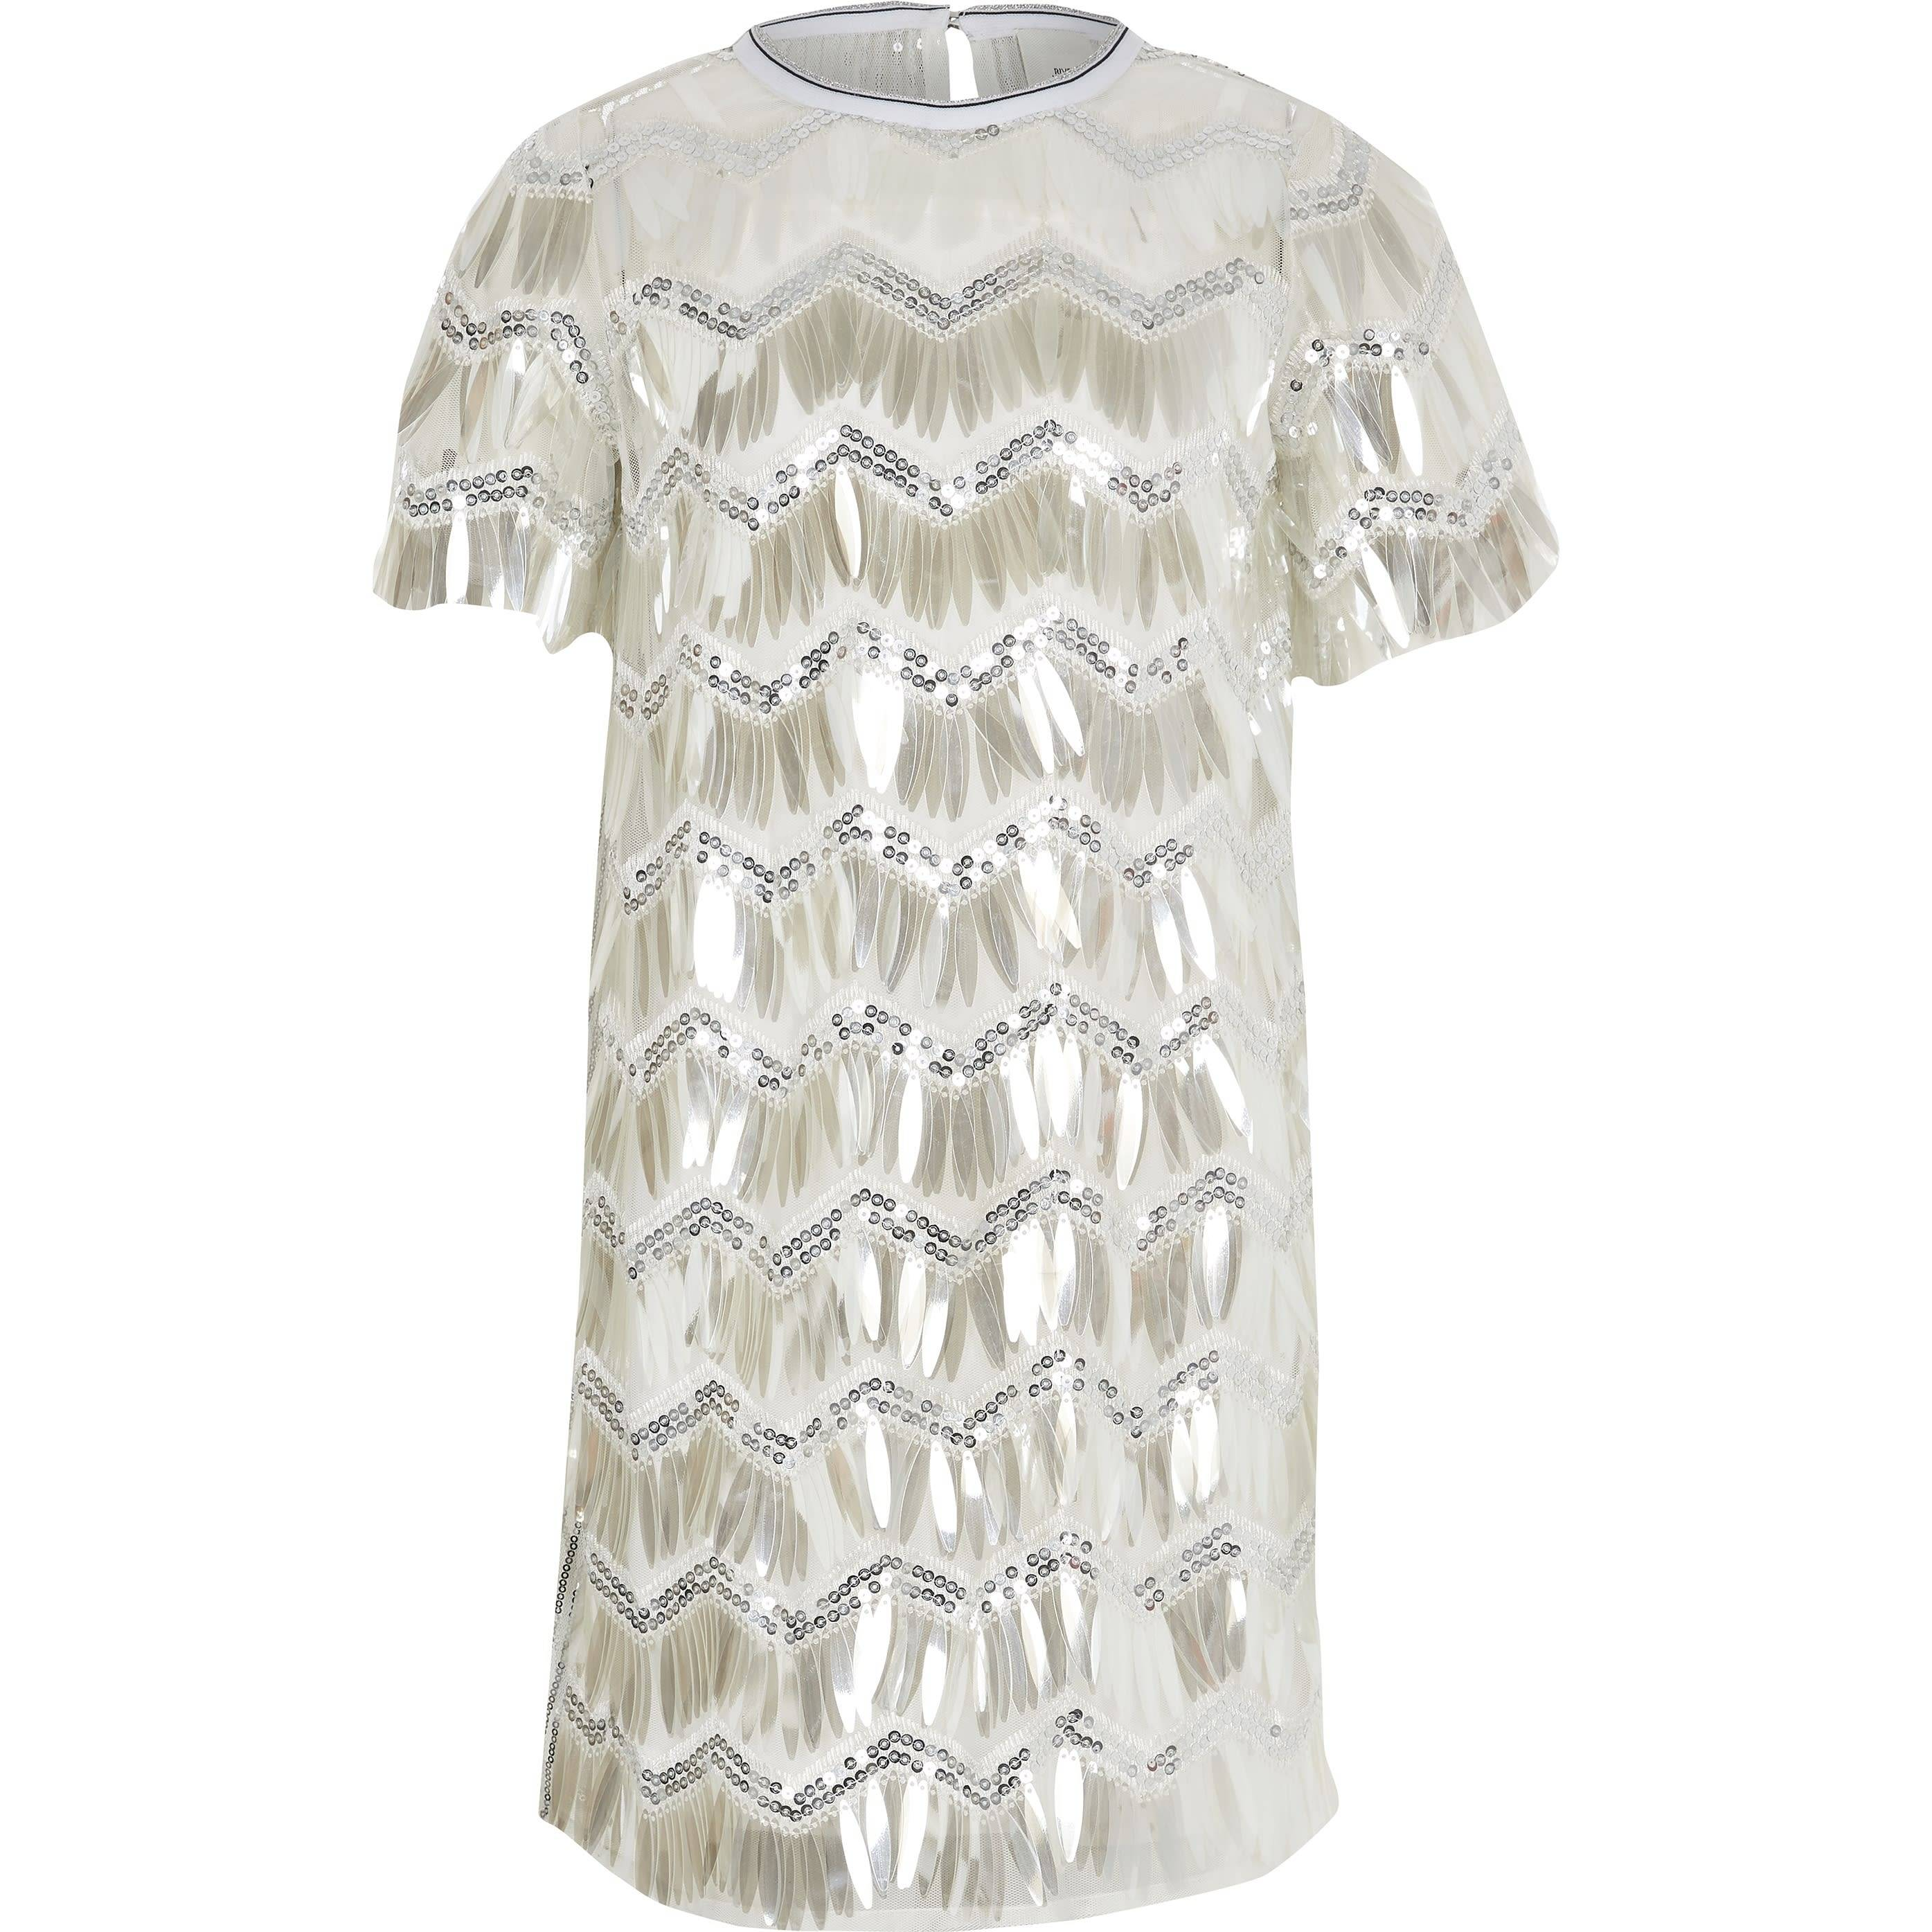 River Island Girls Silver sequin T-shirt dress (9 Yrs)